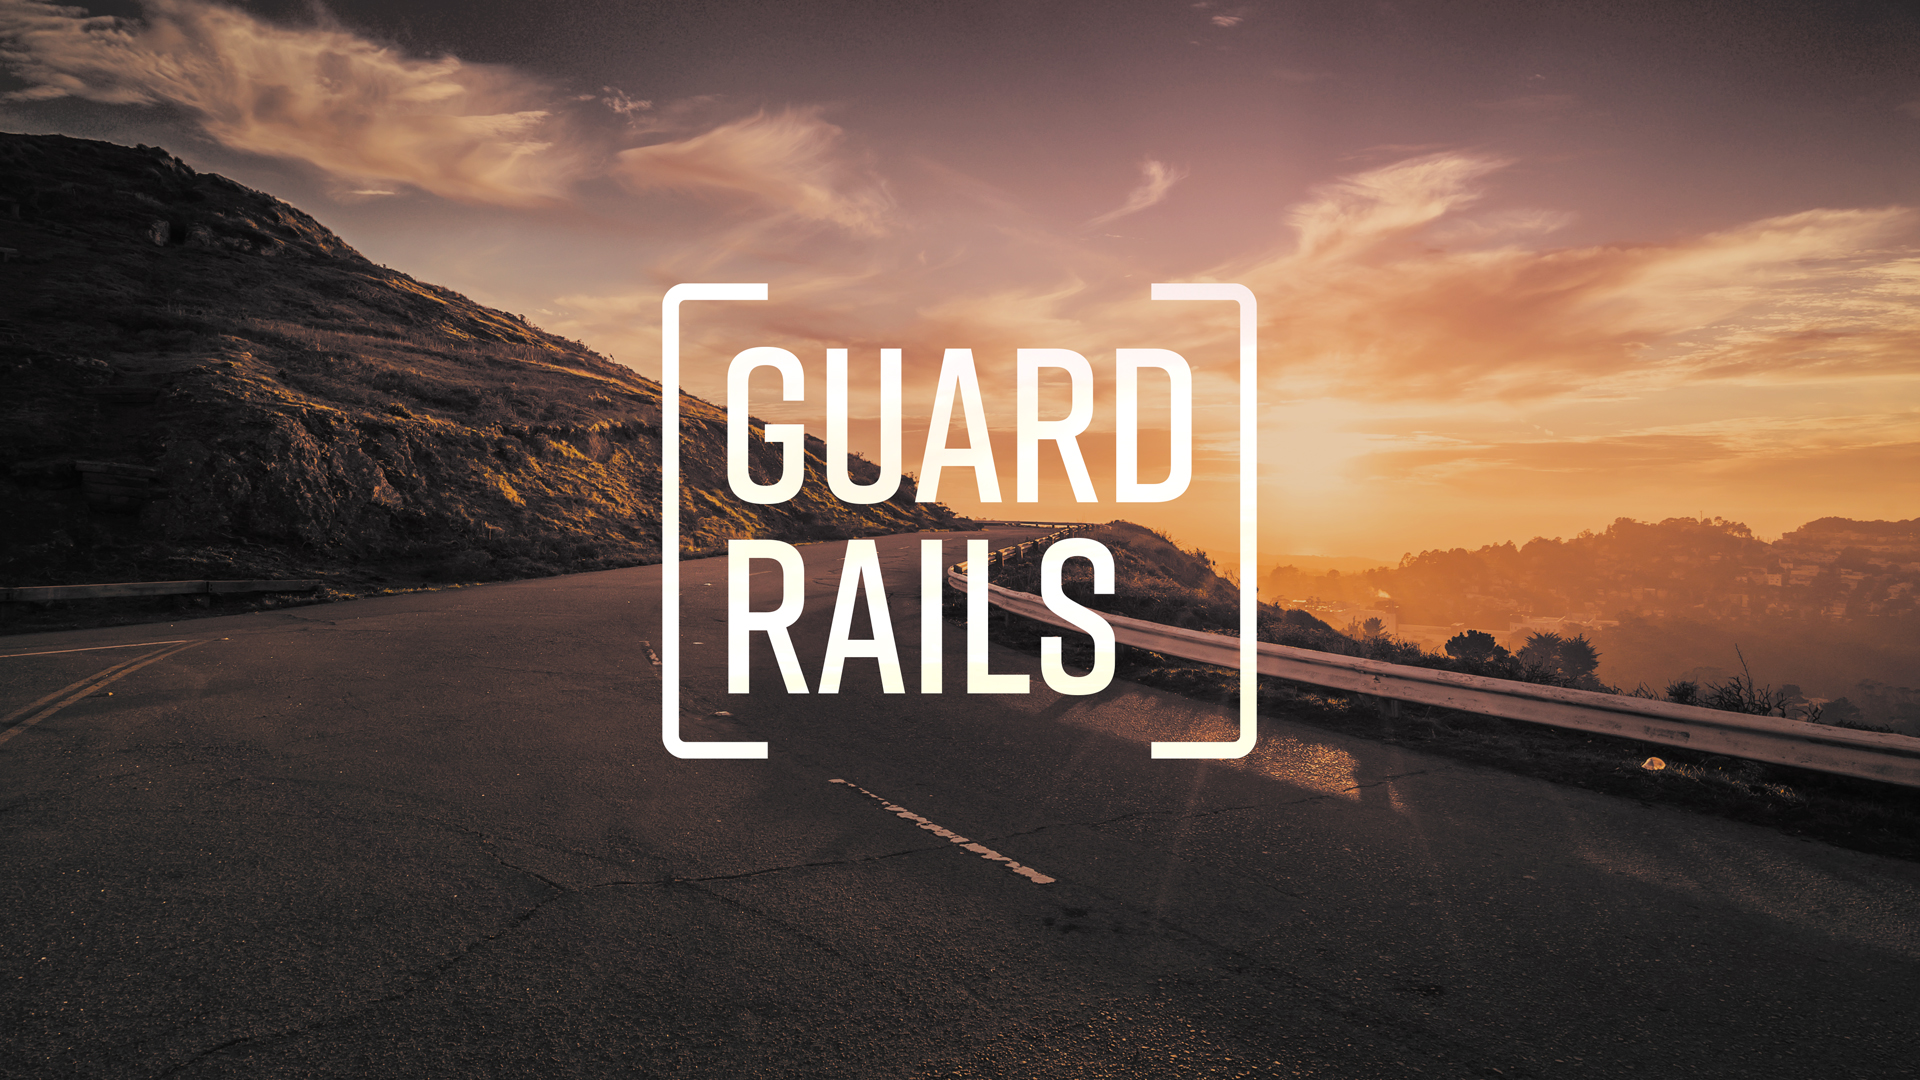 - Guardrails 2: ProximityMay 26, 2019Speaker: Aaron Laramore